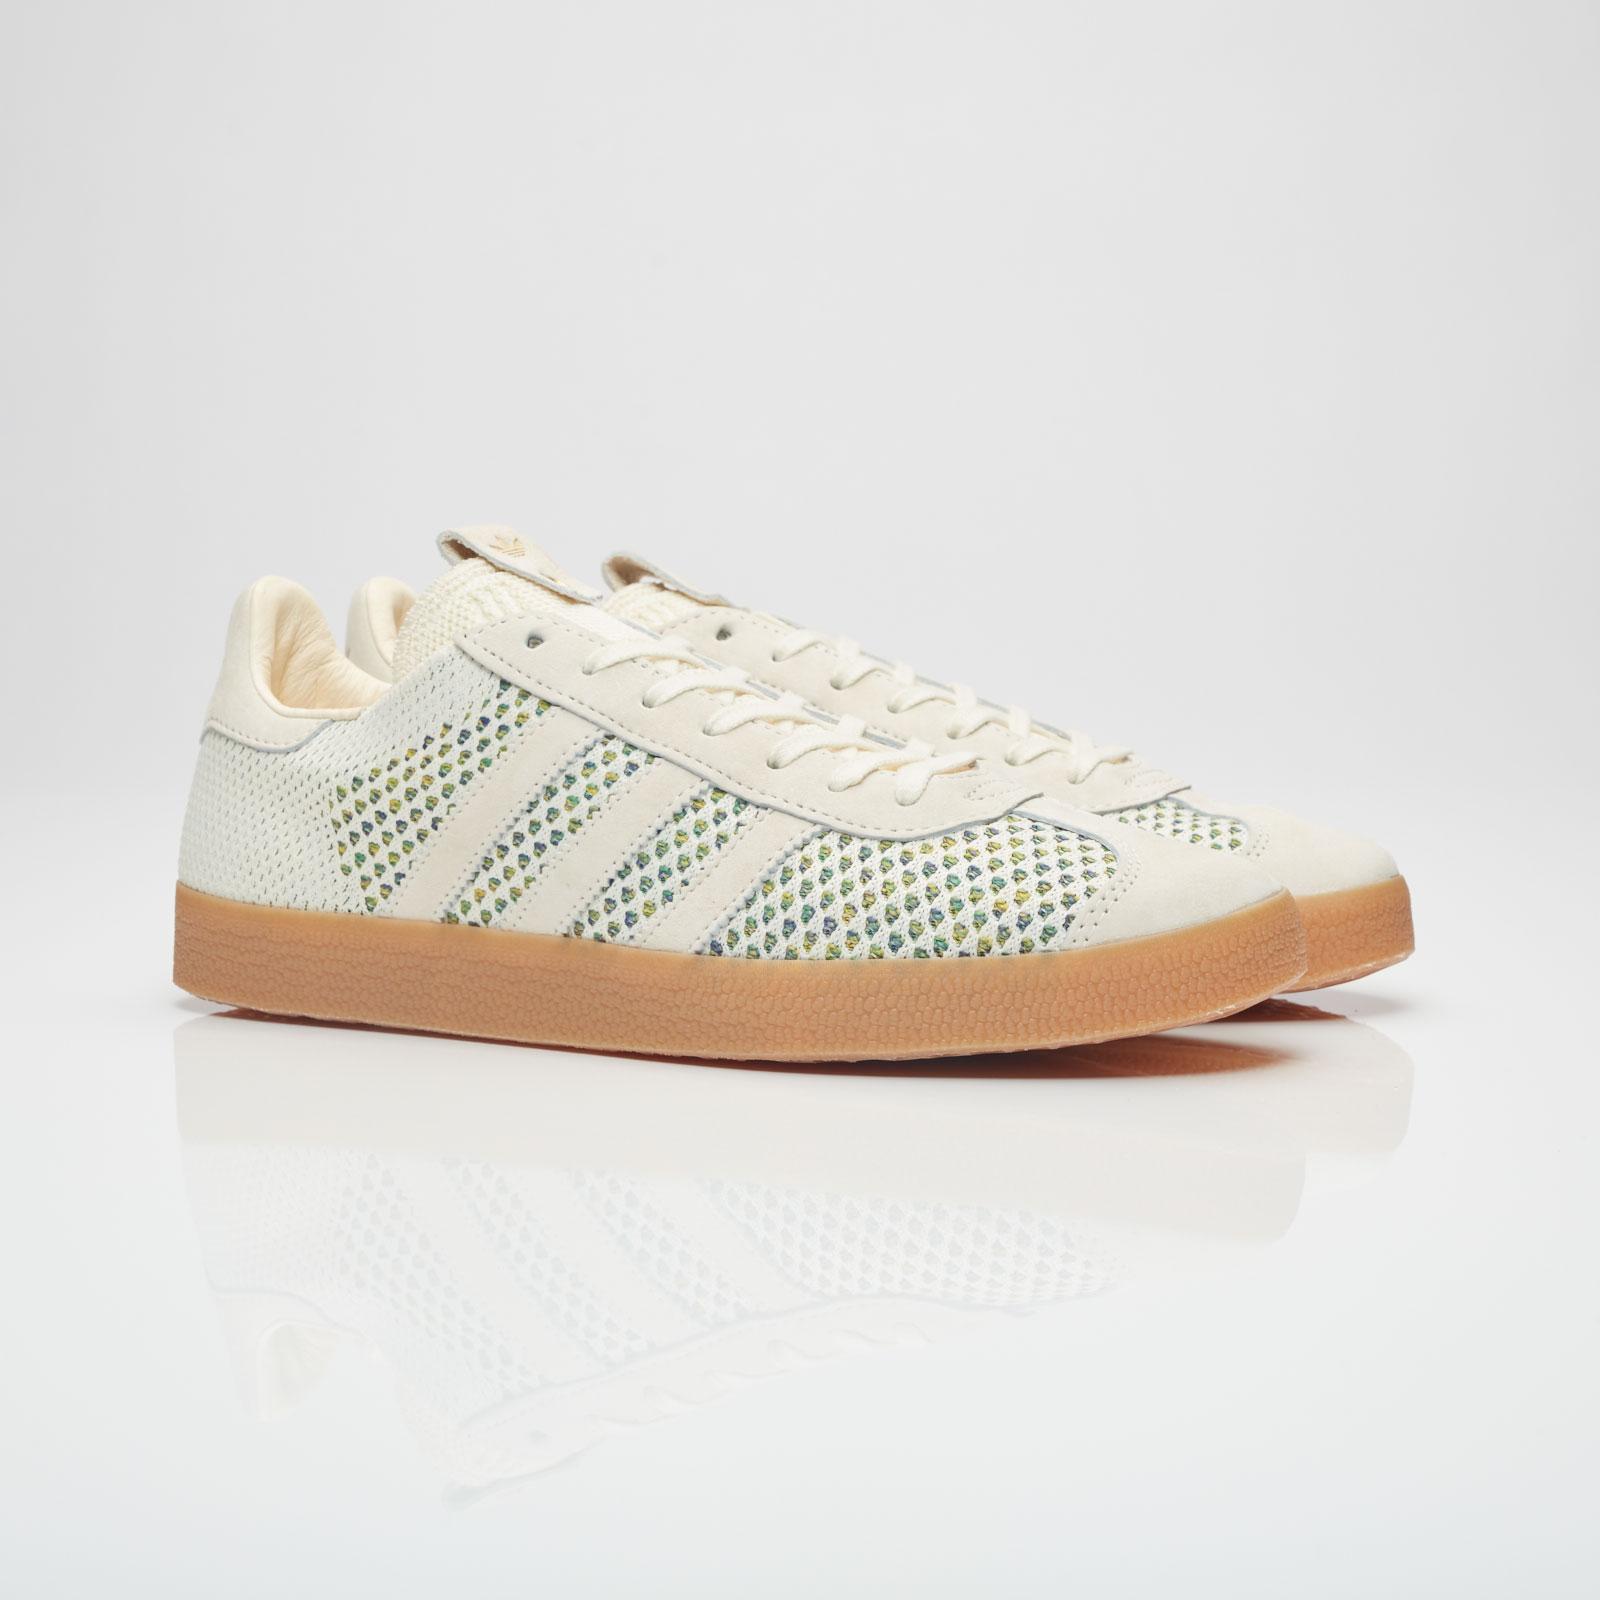 adidas Gazelle Pk Sneaker Politics - By2831 - SNS   sneakers ...